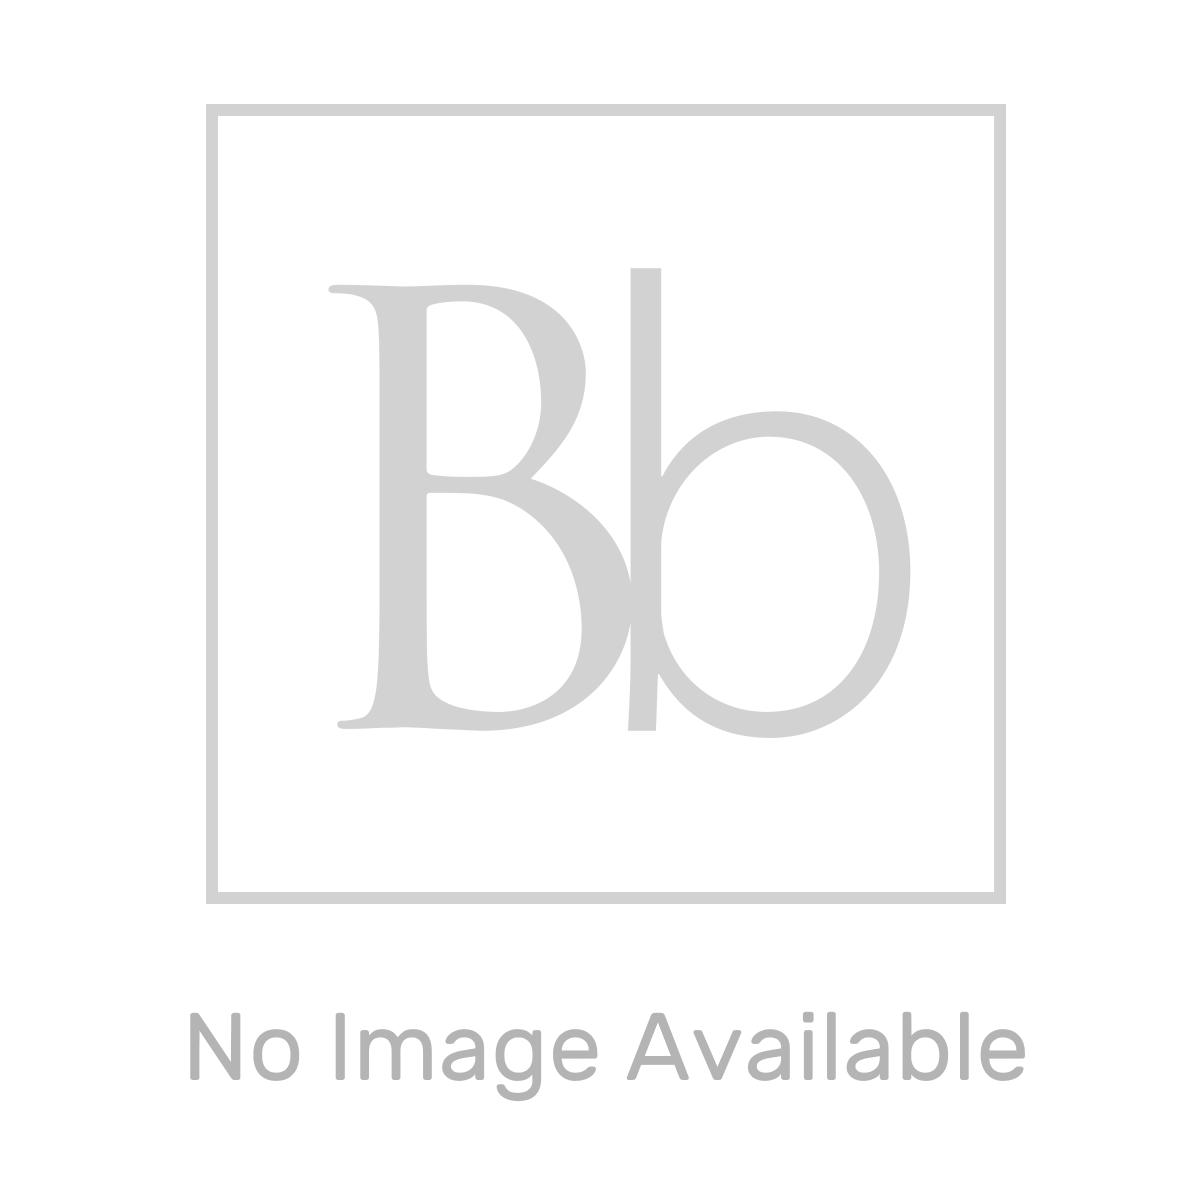 Ceramic 18mm Profile Basin Line Drawing